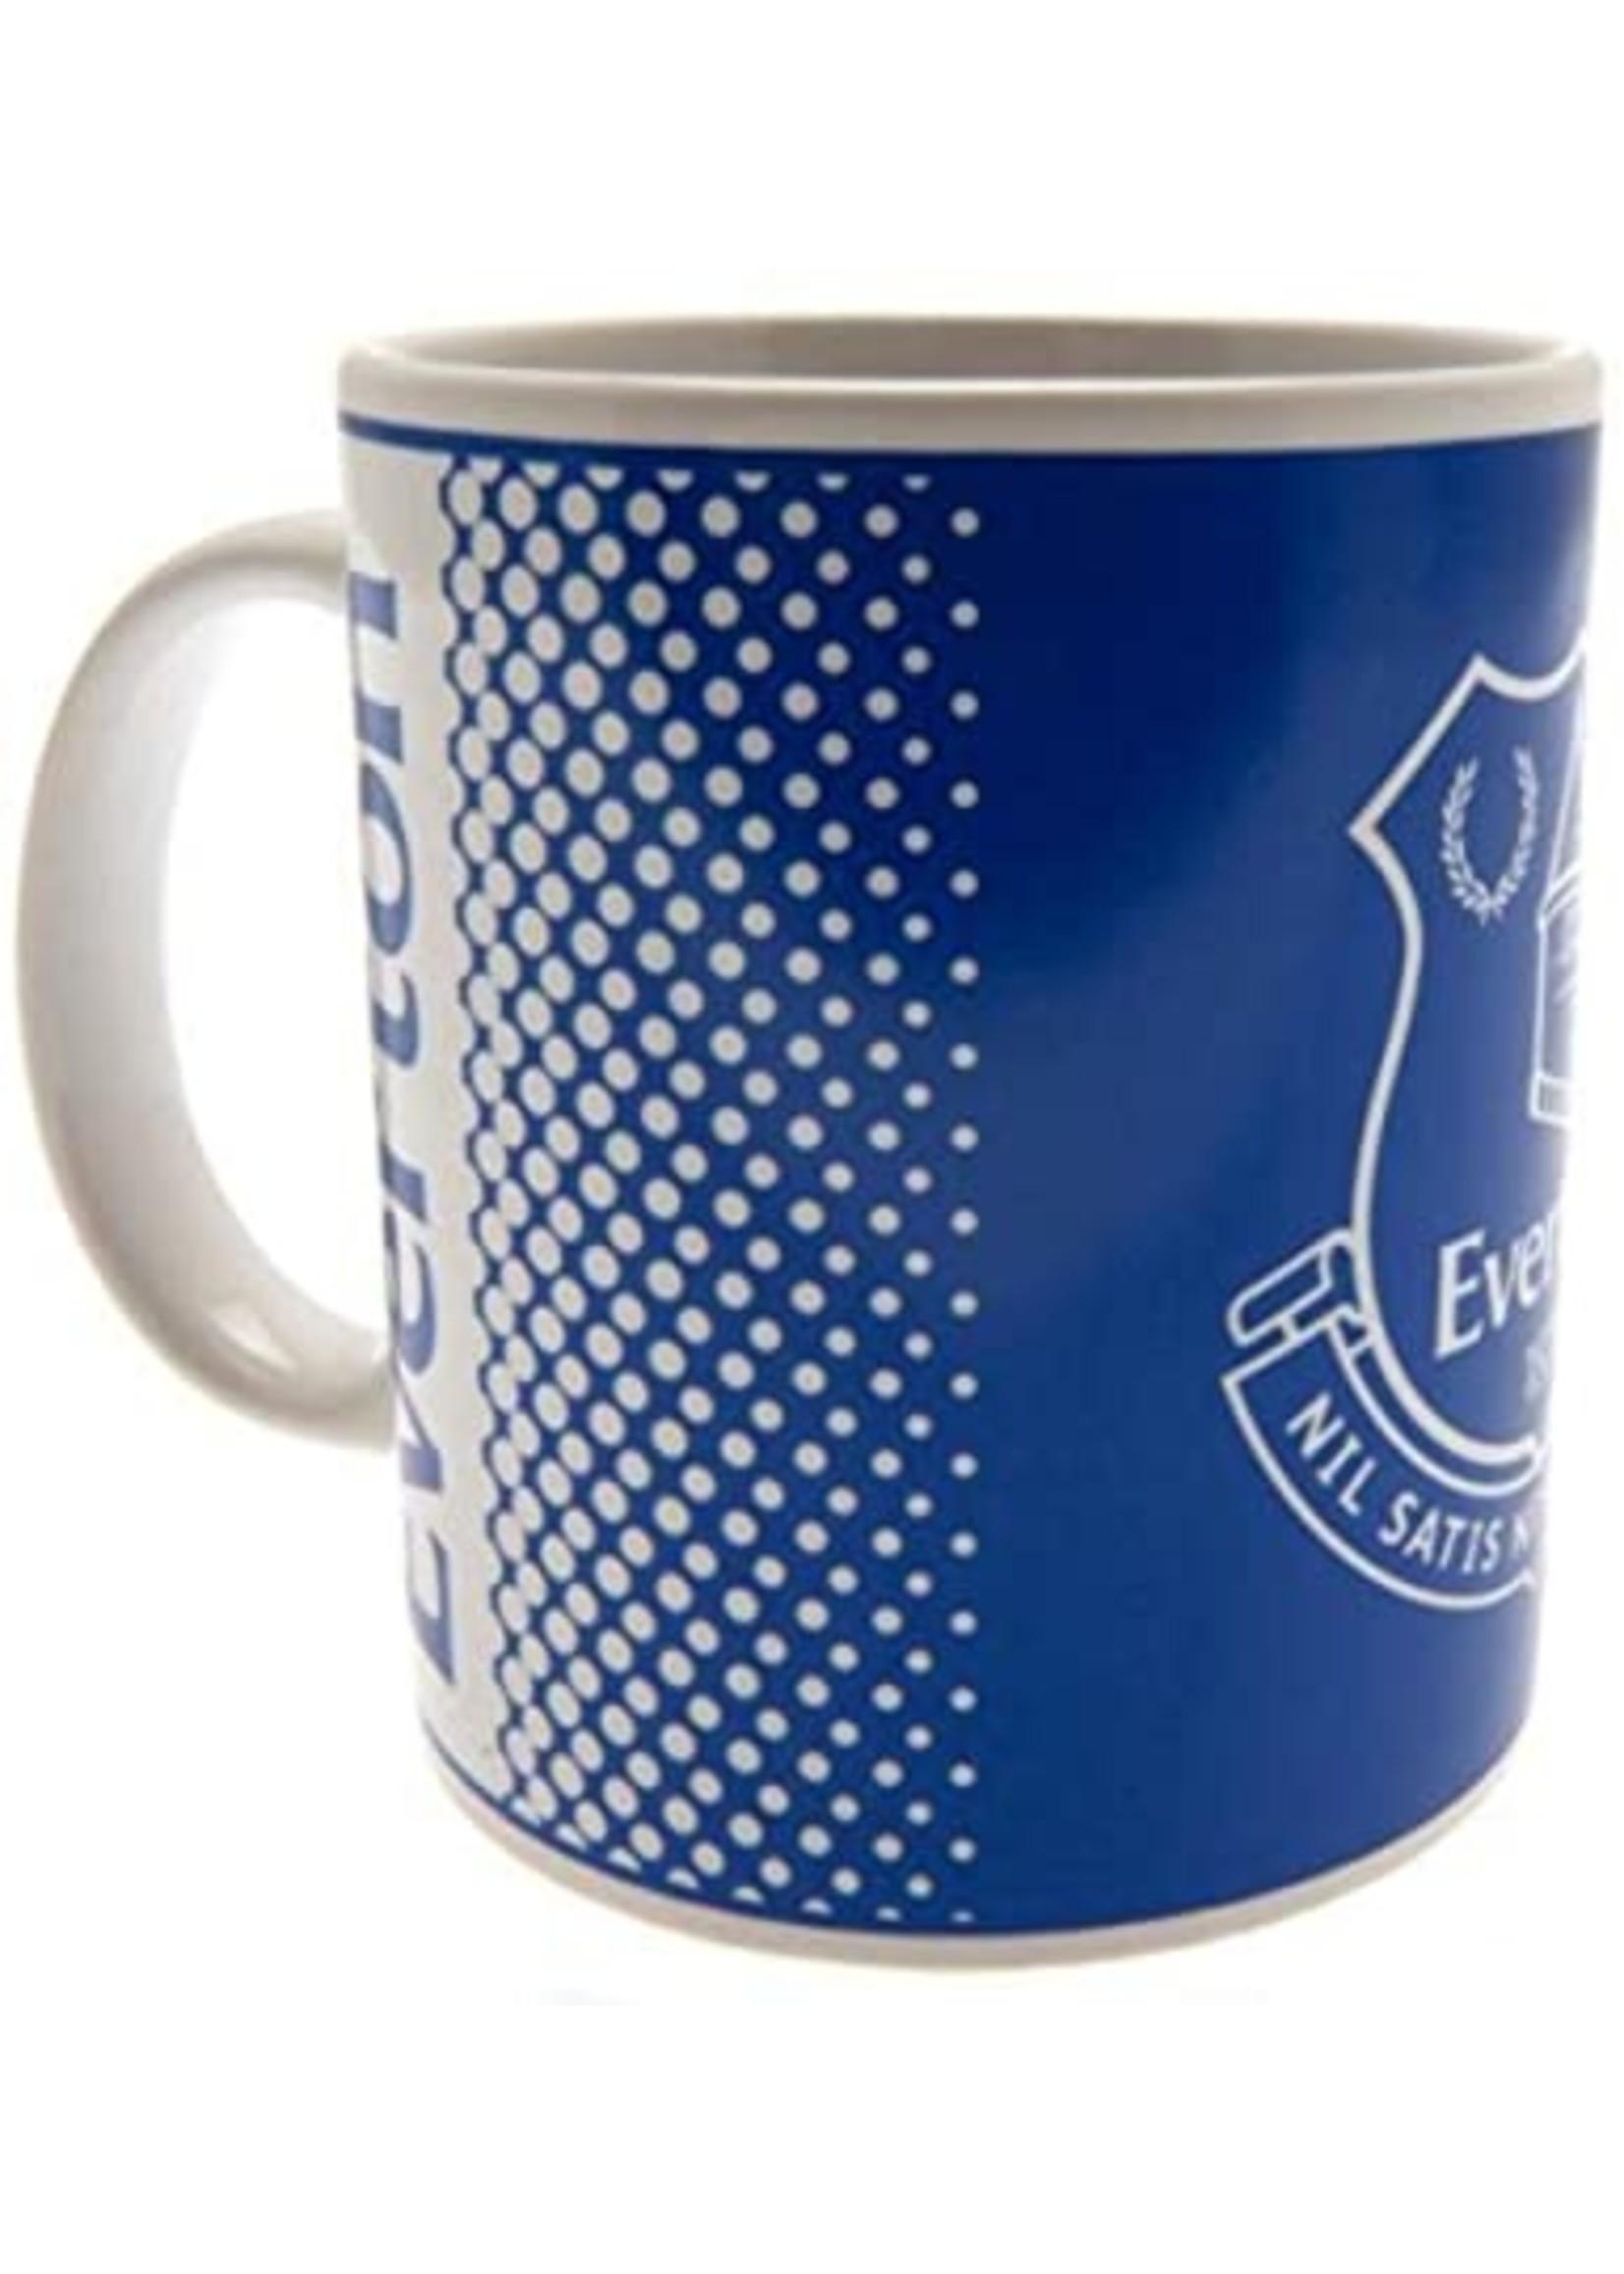 Everton Coffee Mug